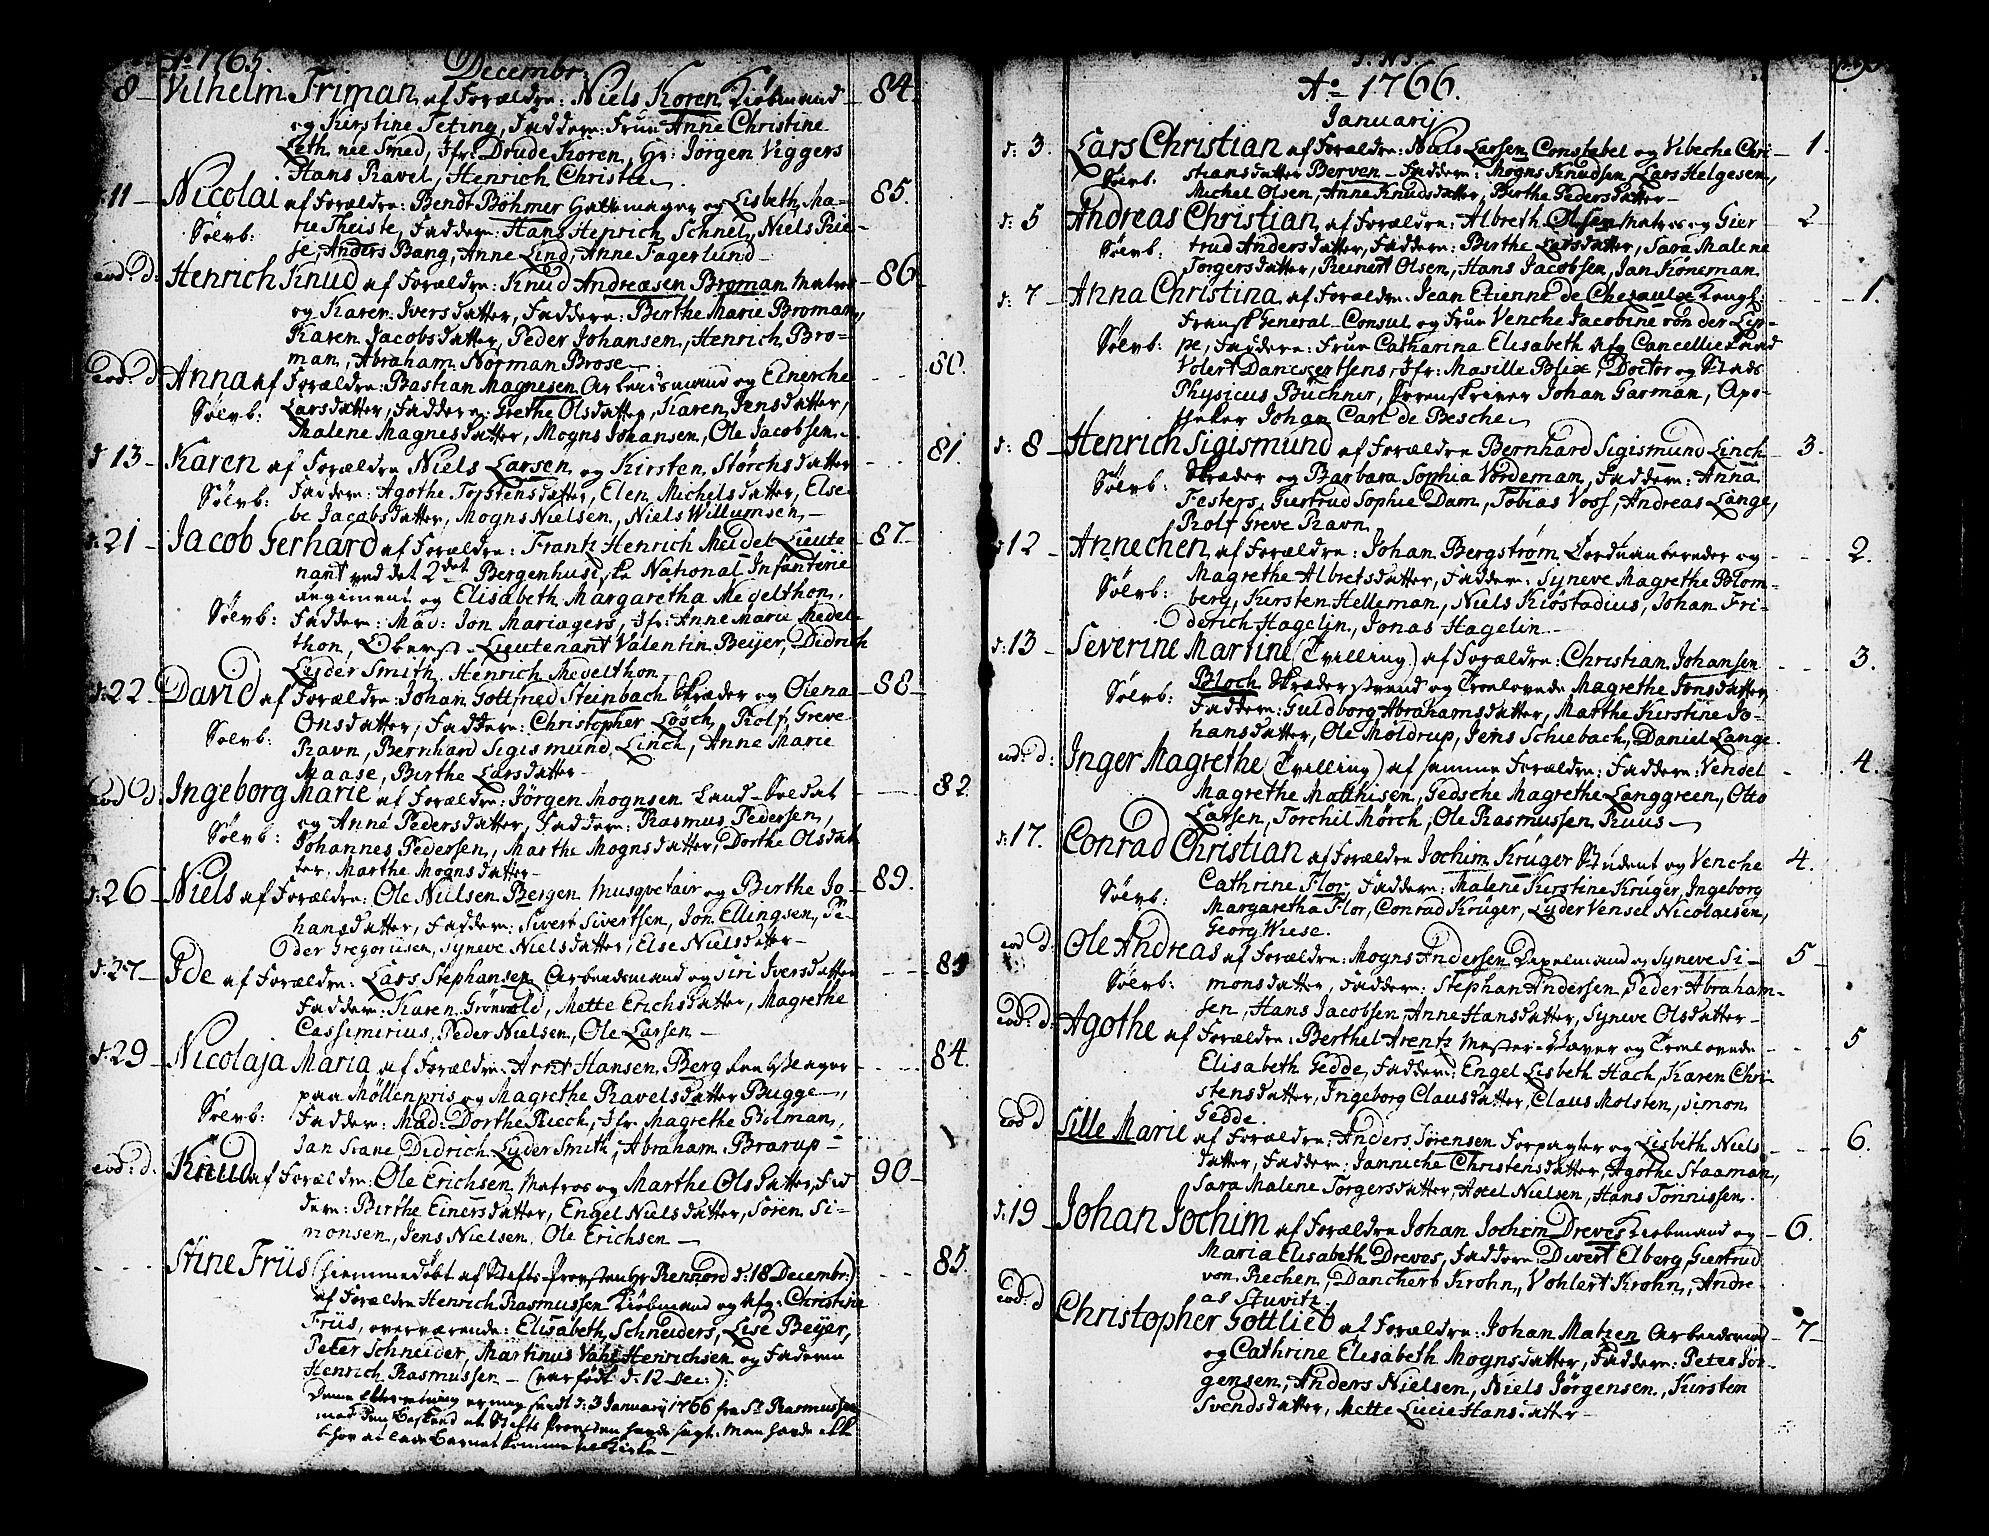 SAB, Domkirken sokneprestembete, H/Haa/L0003: Ministerialbok nr. A 3, 1758-1789, s. 94-95